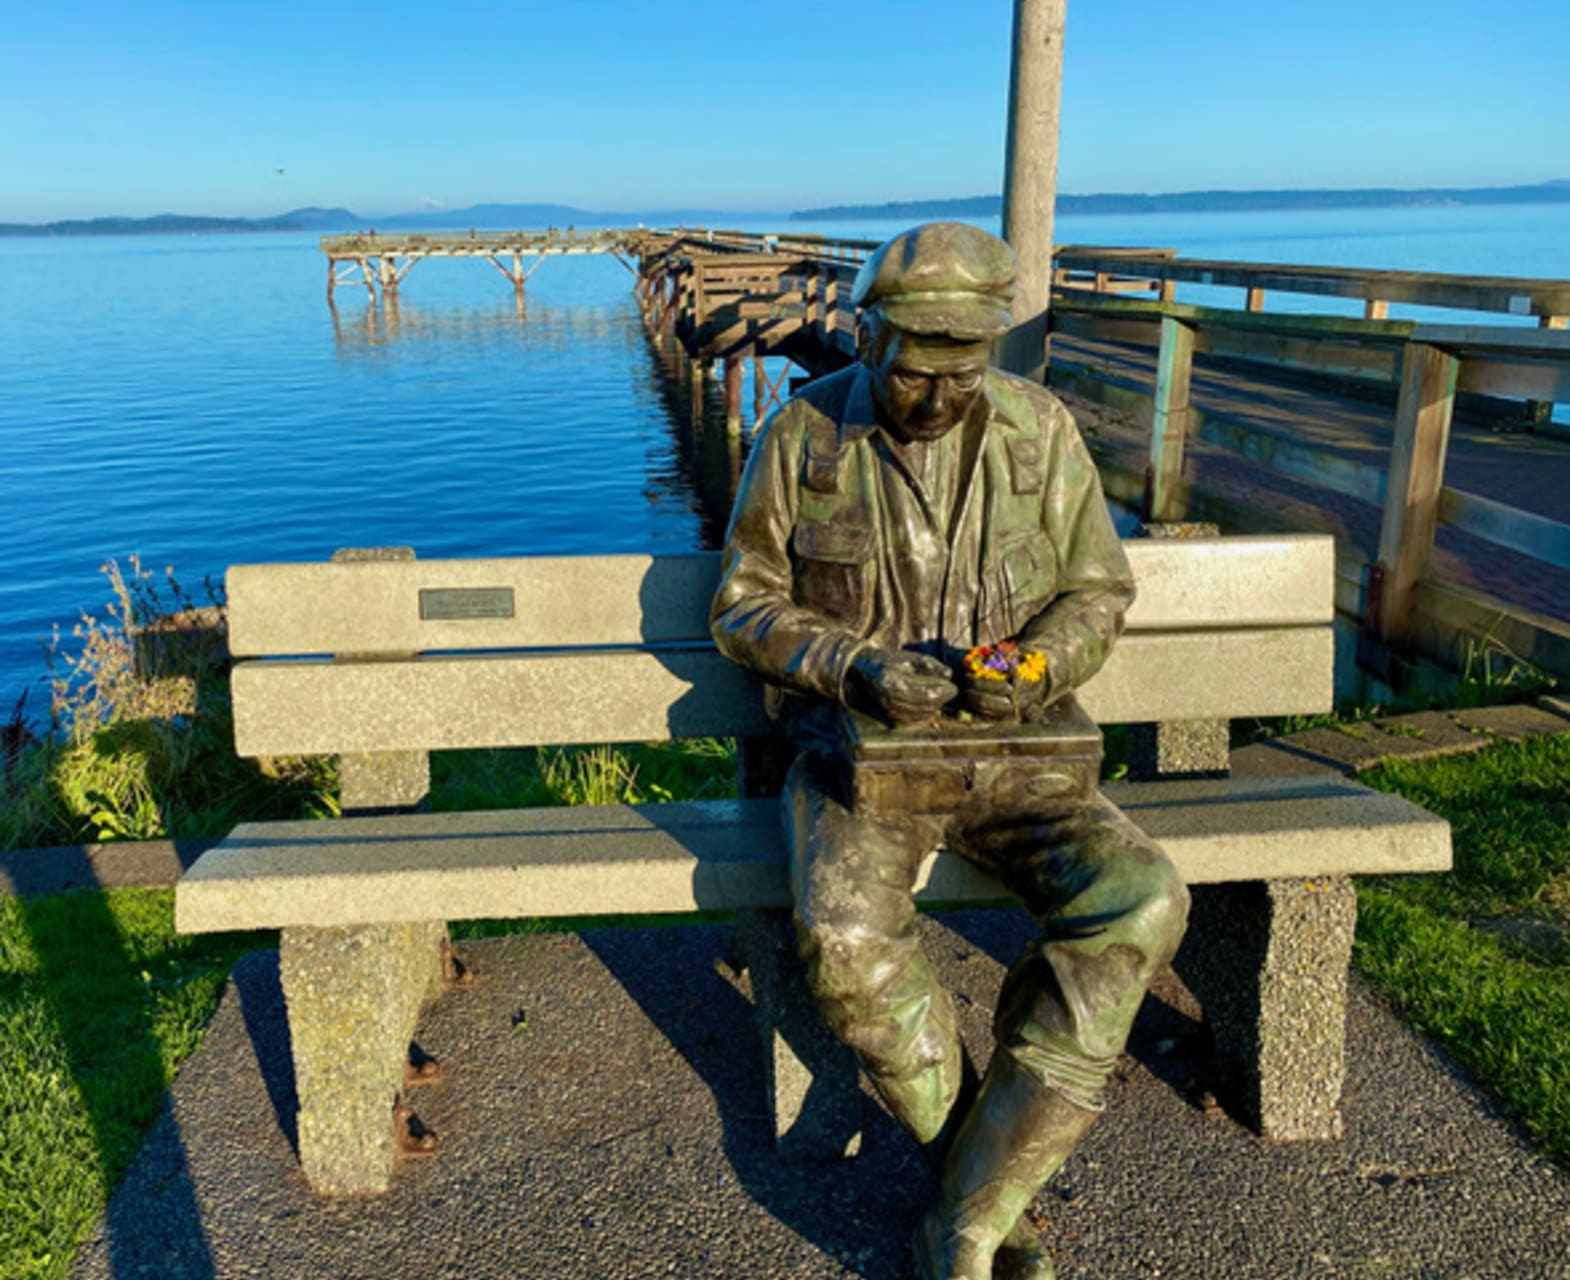 Victoria, BC - Sidney by the Sea - Art Walk